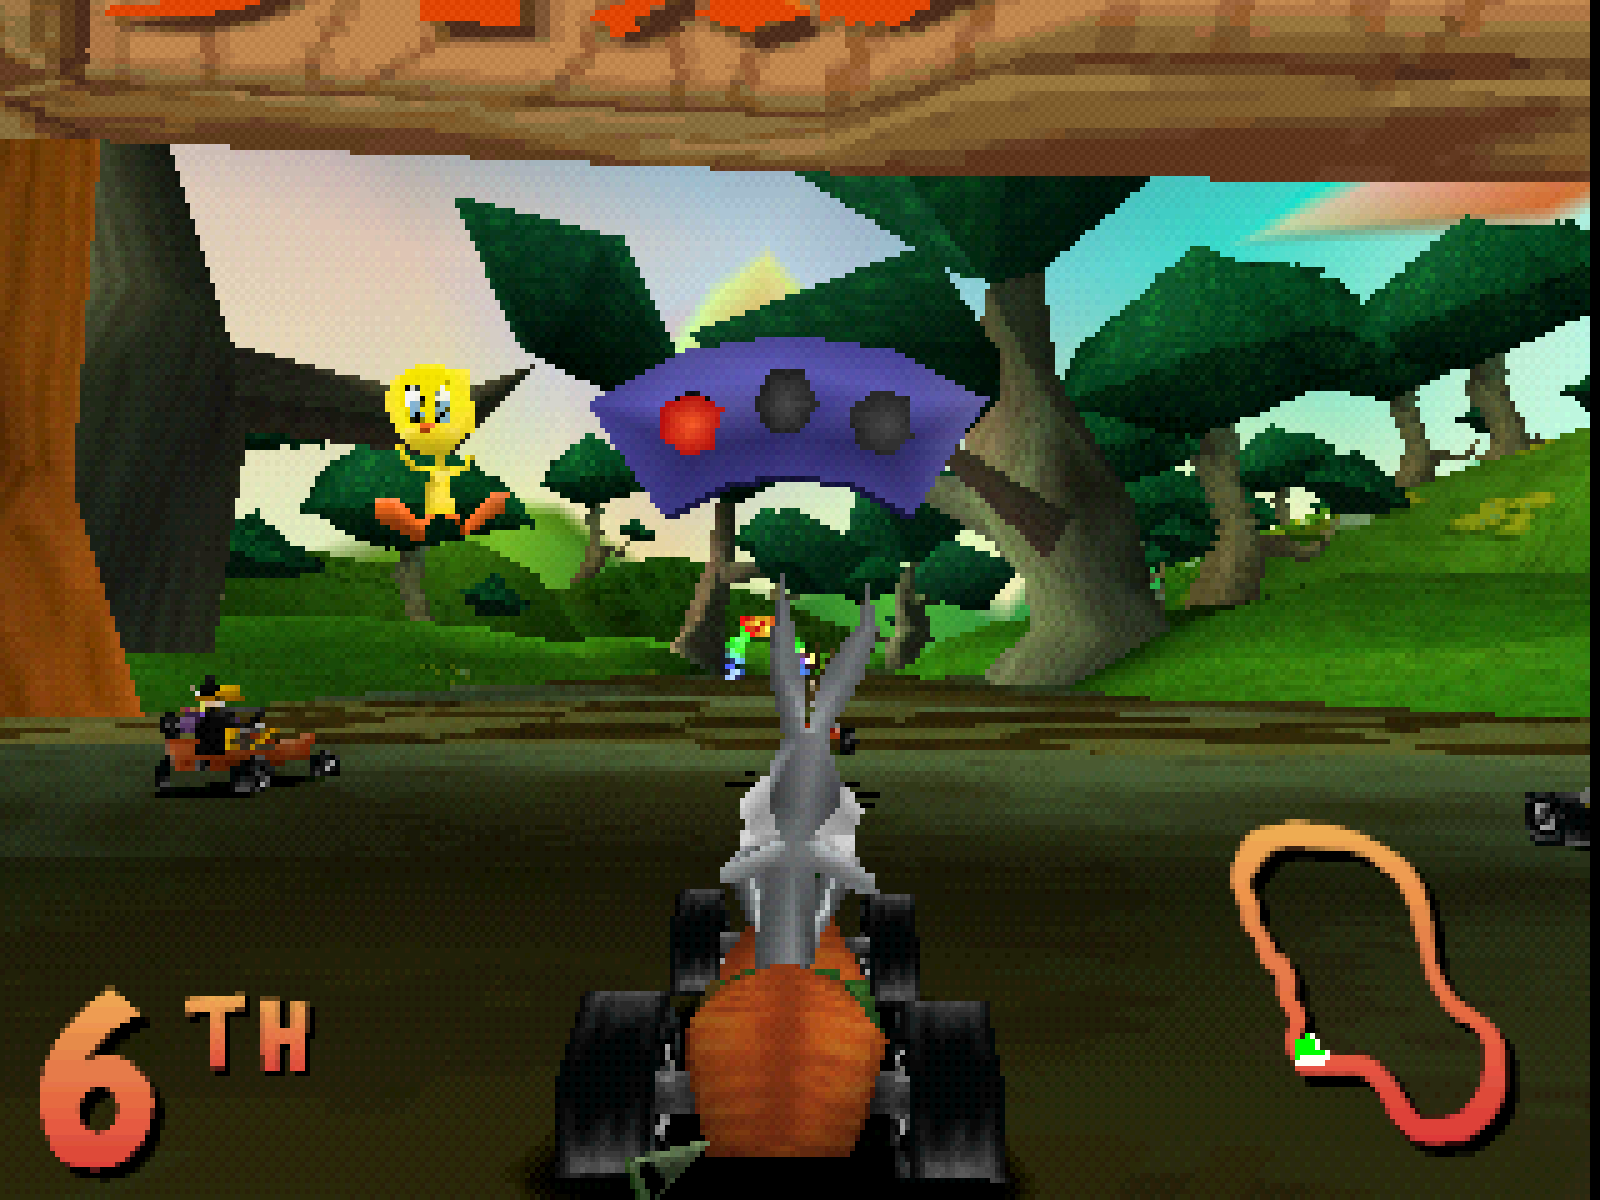 How to upscale LSD: Dream Emulator in a PlayStation emulator : OsamuSato